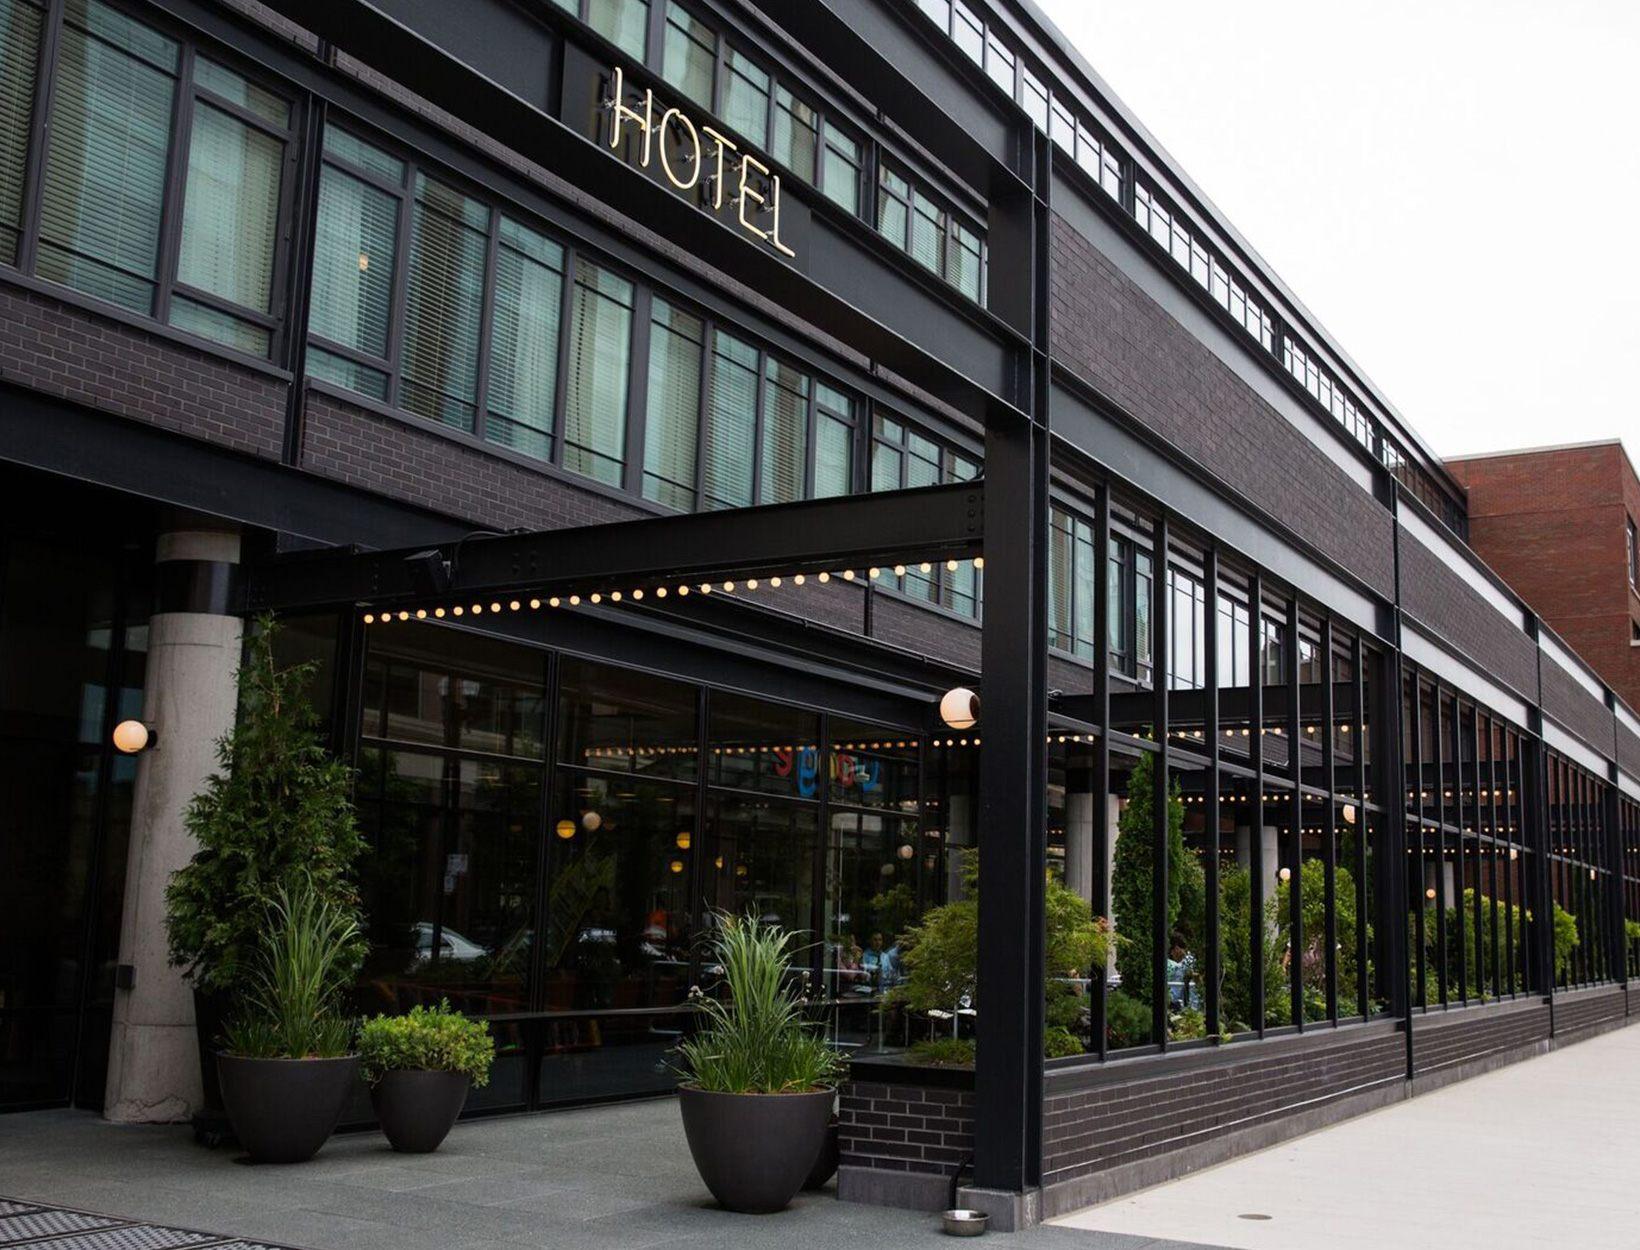 Ace-Hotel-Chicago-4.jpg